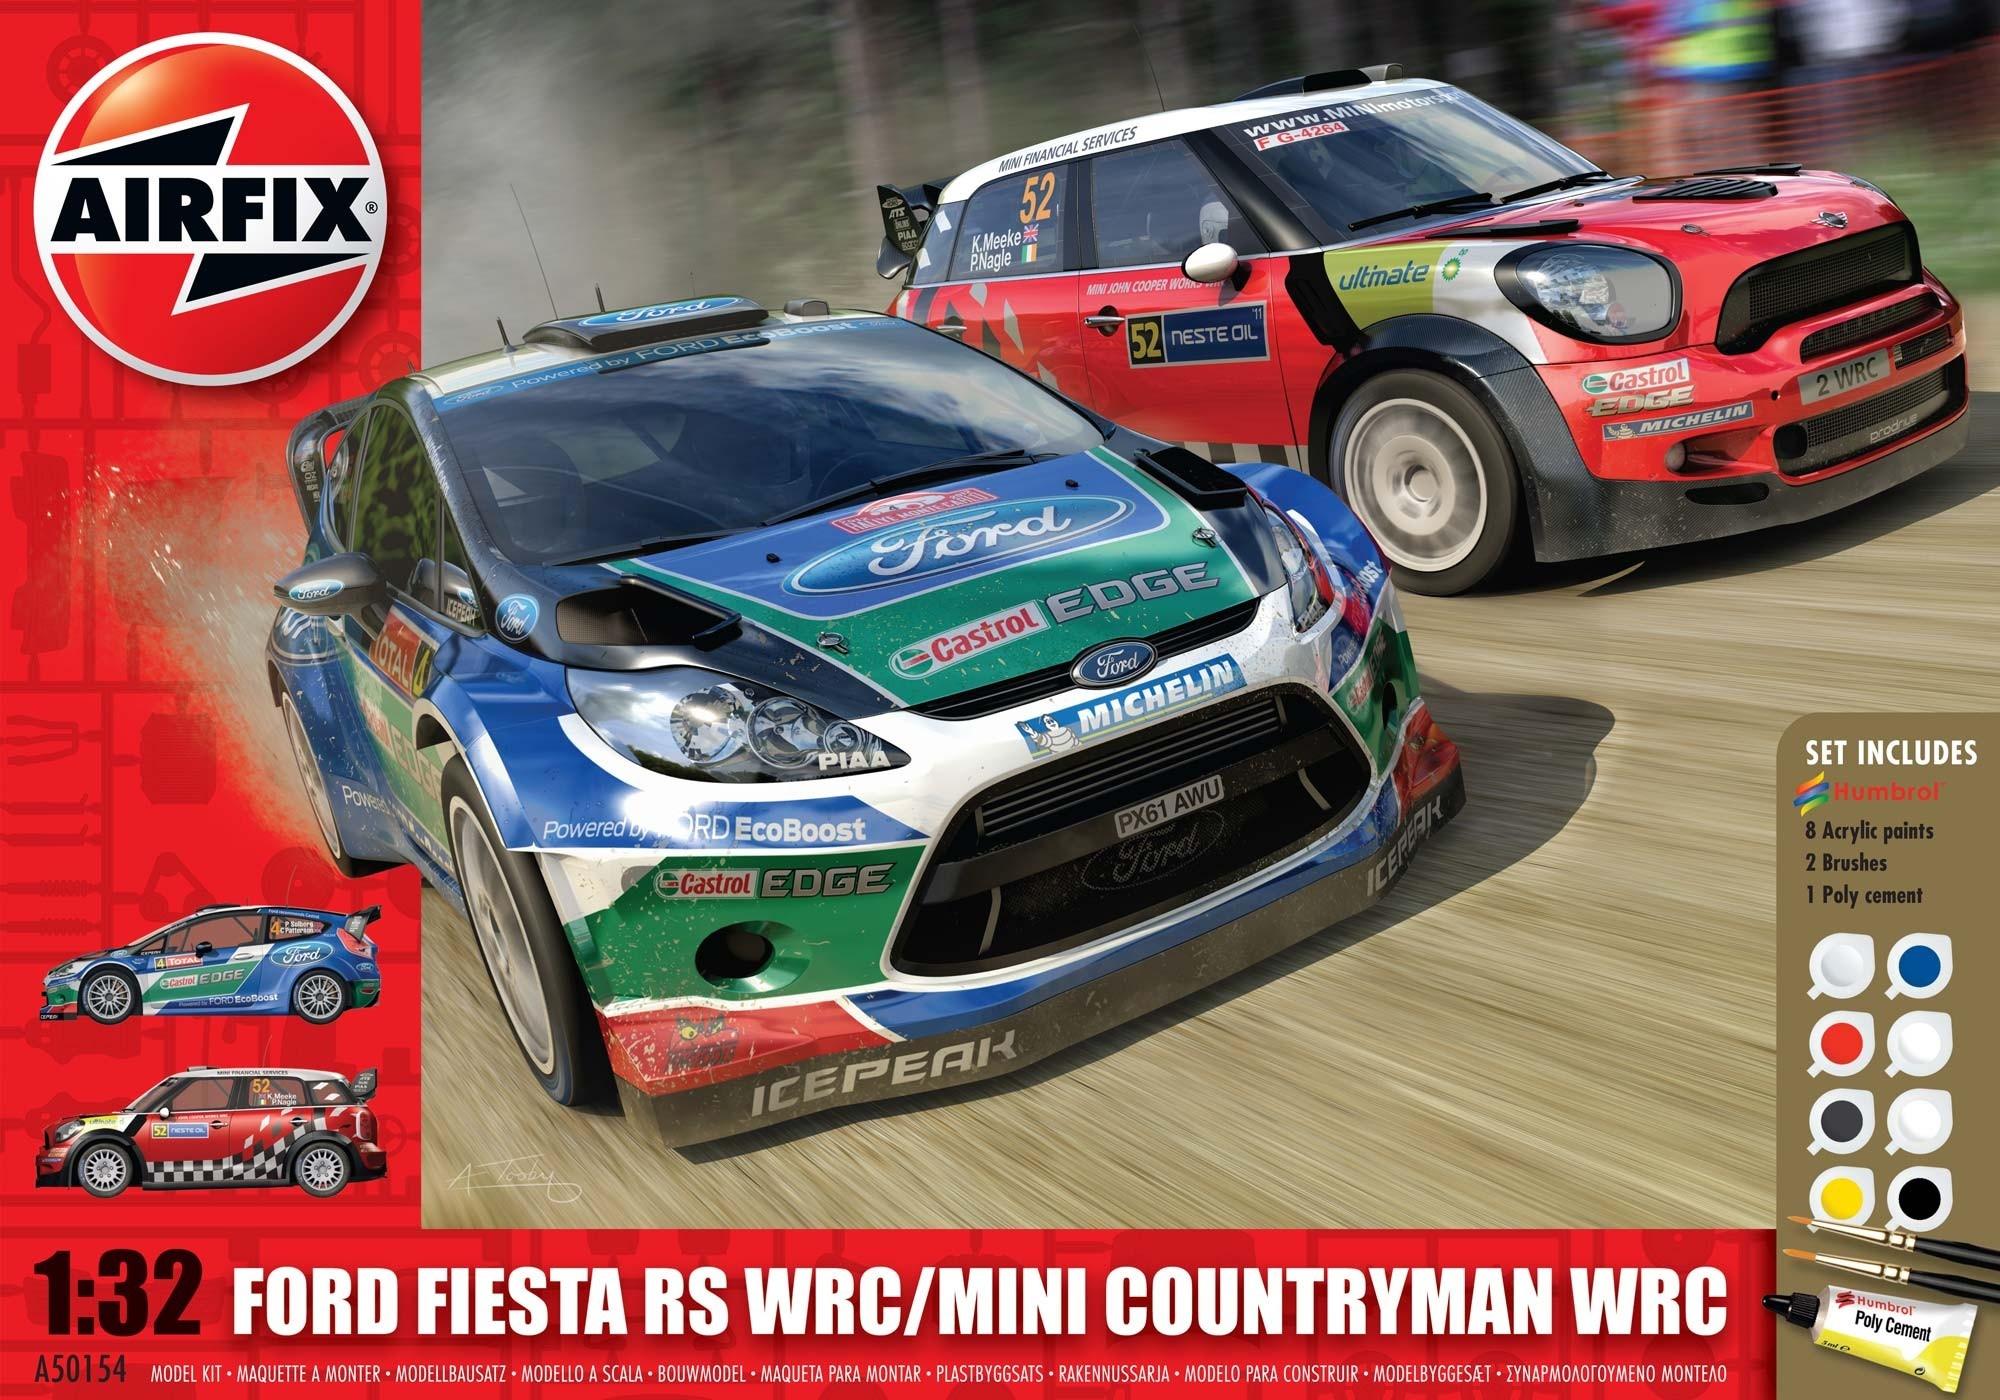 Airfix Mini Countryman Wrc/Ford Fiesta Wrc  - Scale 1/32 - Airfix - AIX A50154